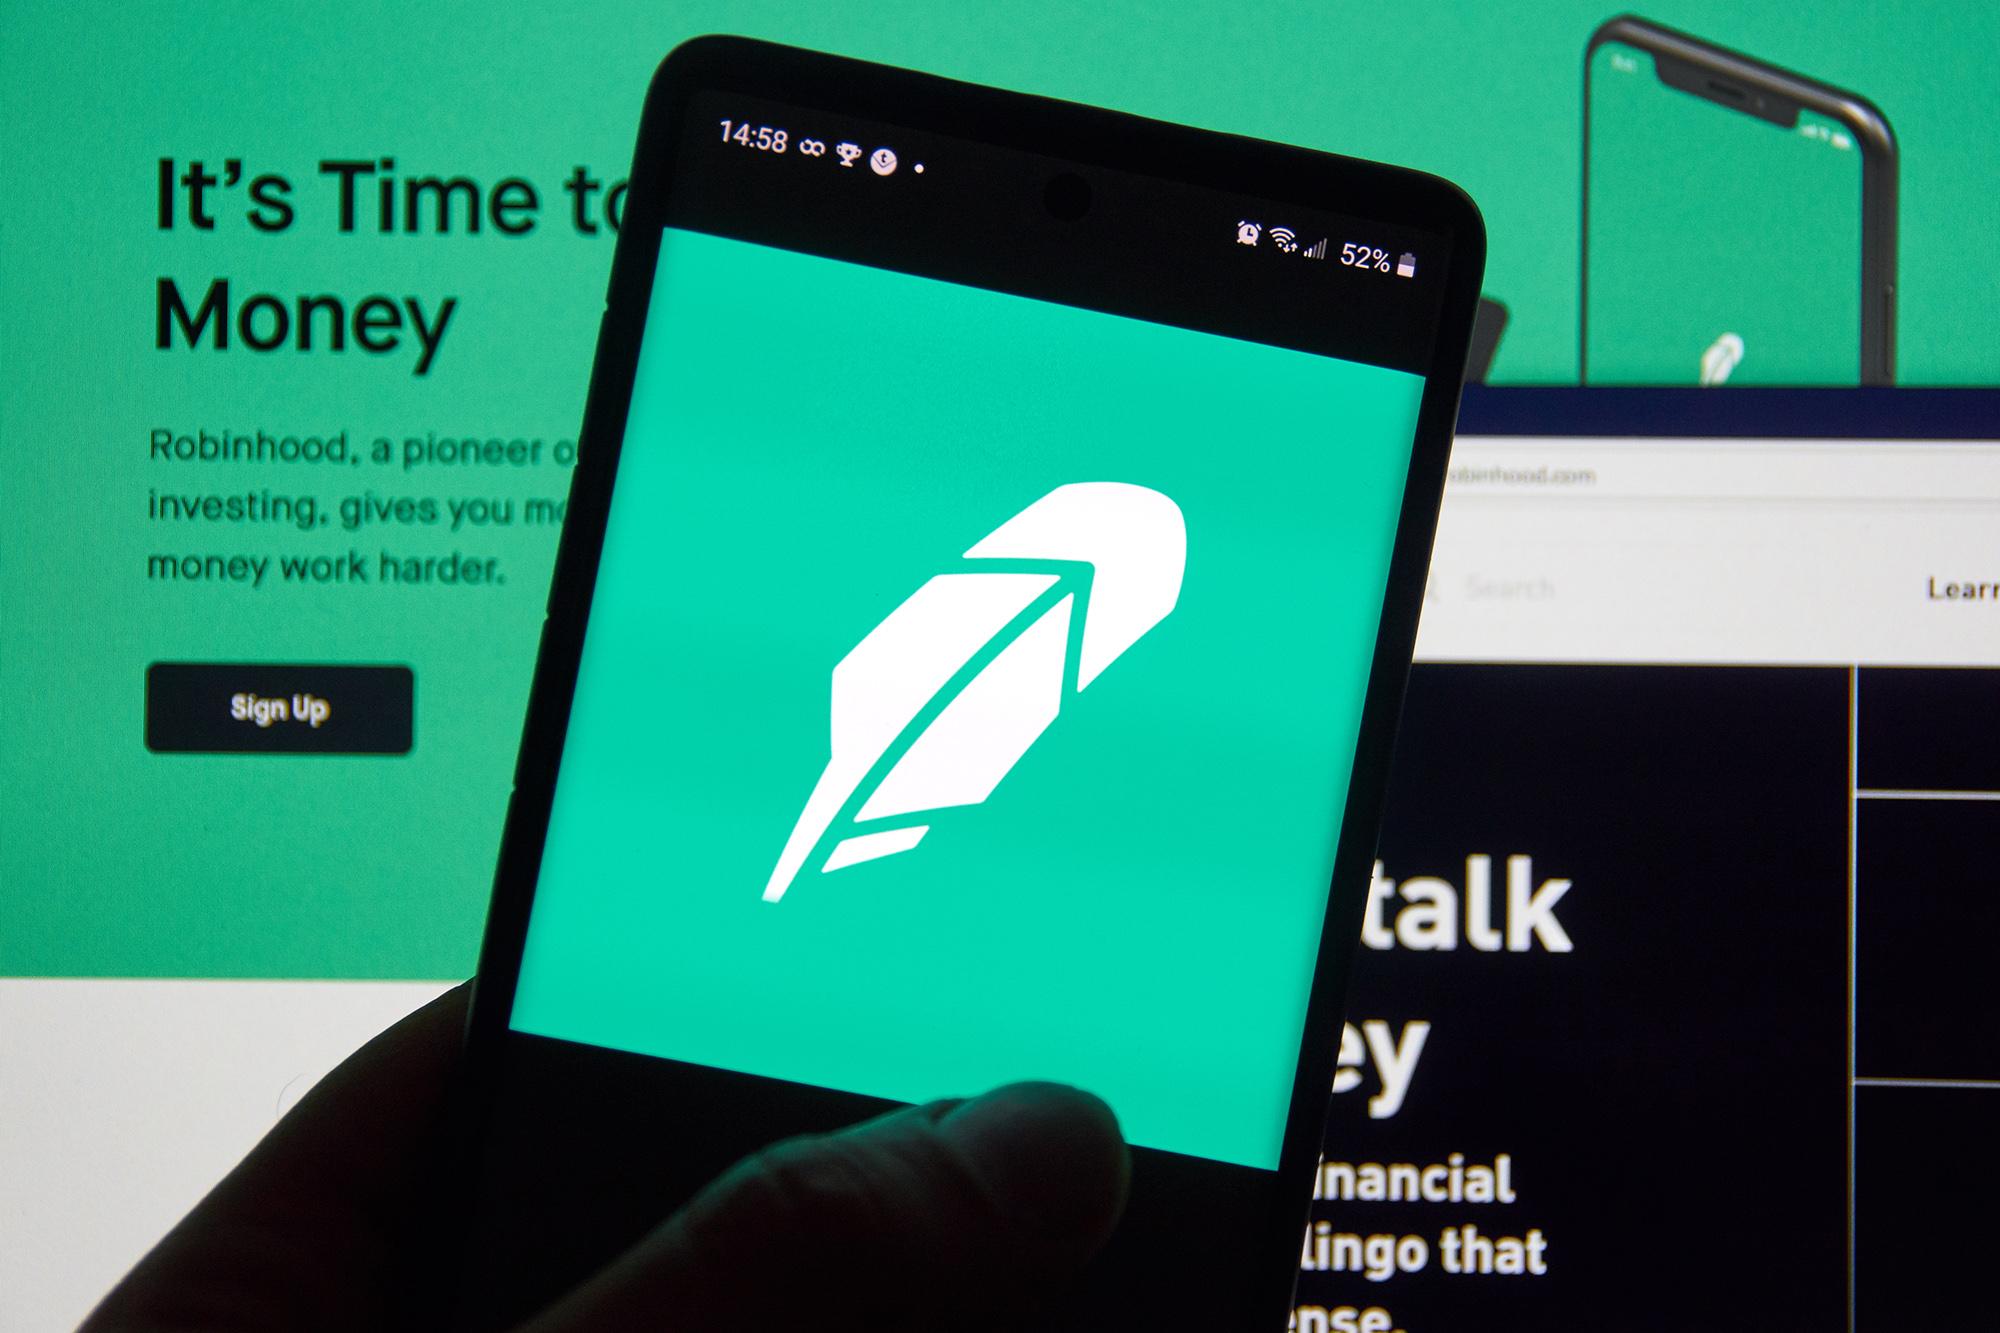 robinhood stock app faces potential lawsuit in massachusetts